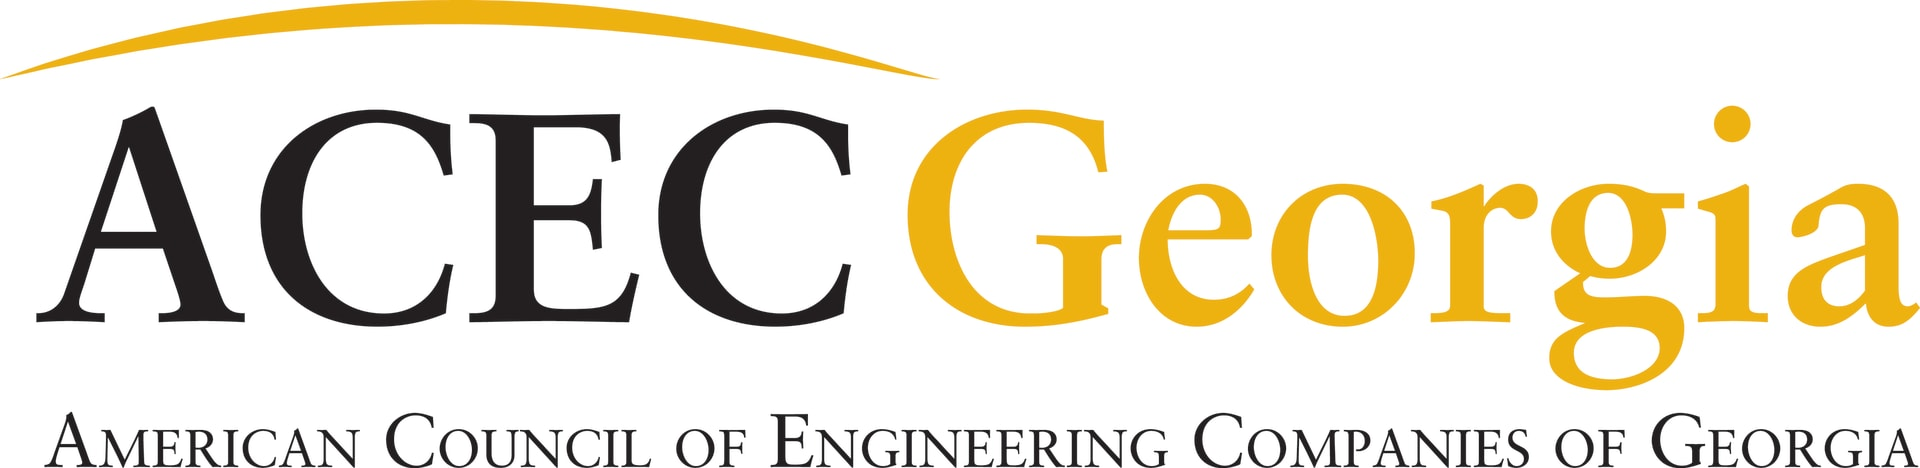 ACEC-Georgia-Logo-1920px.jpg